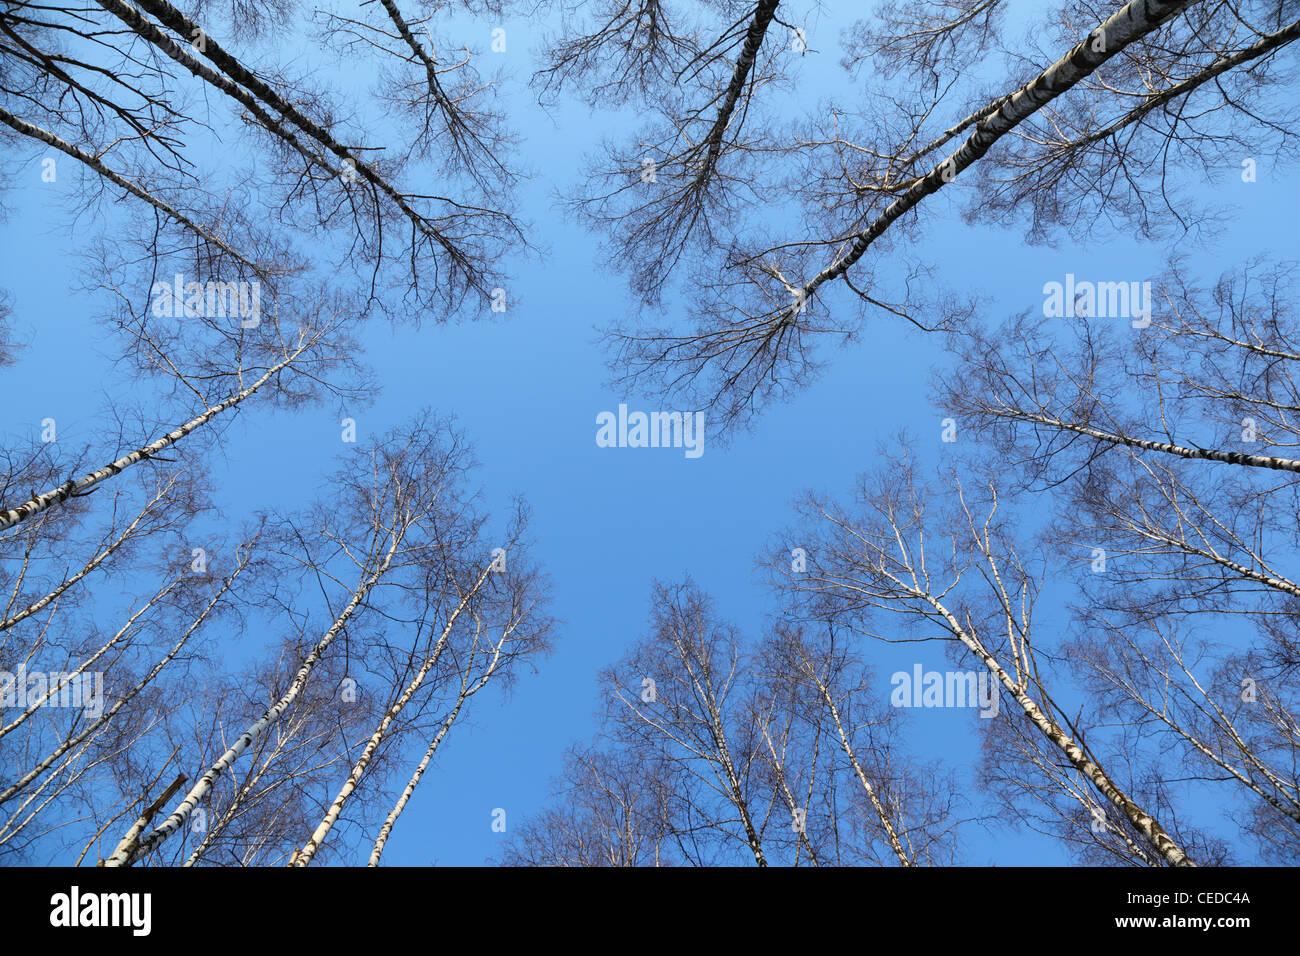 Sommet des arbres Photo Stock